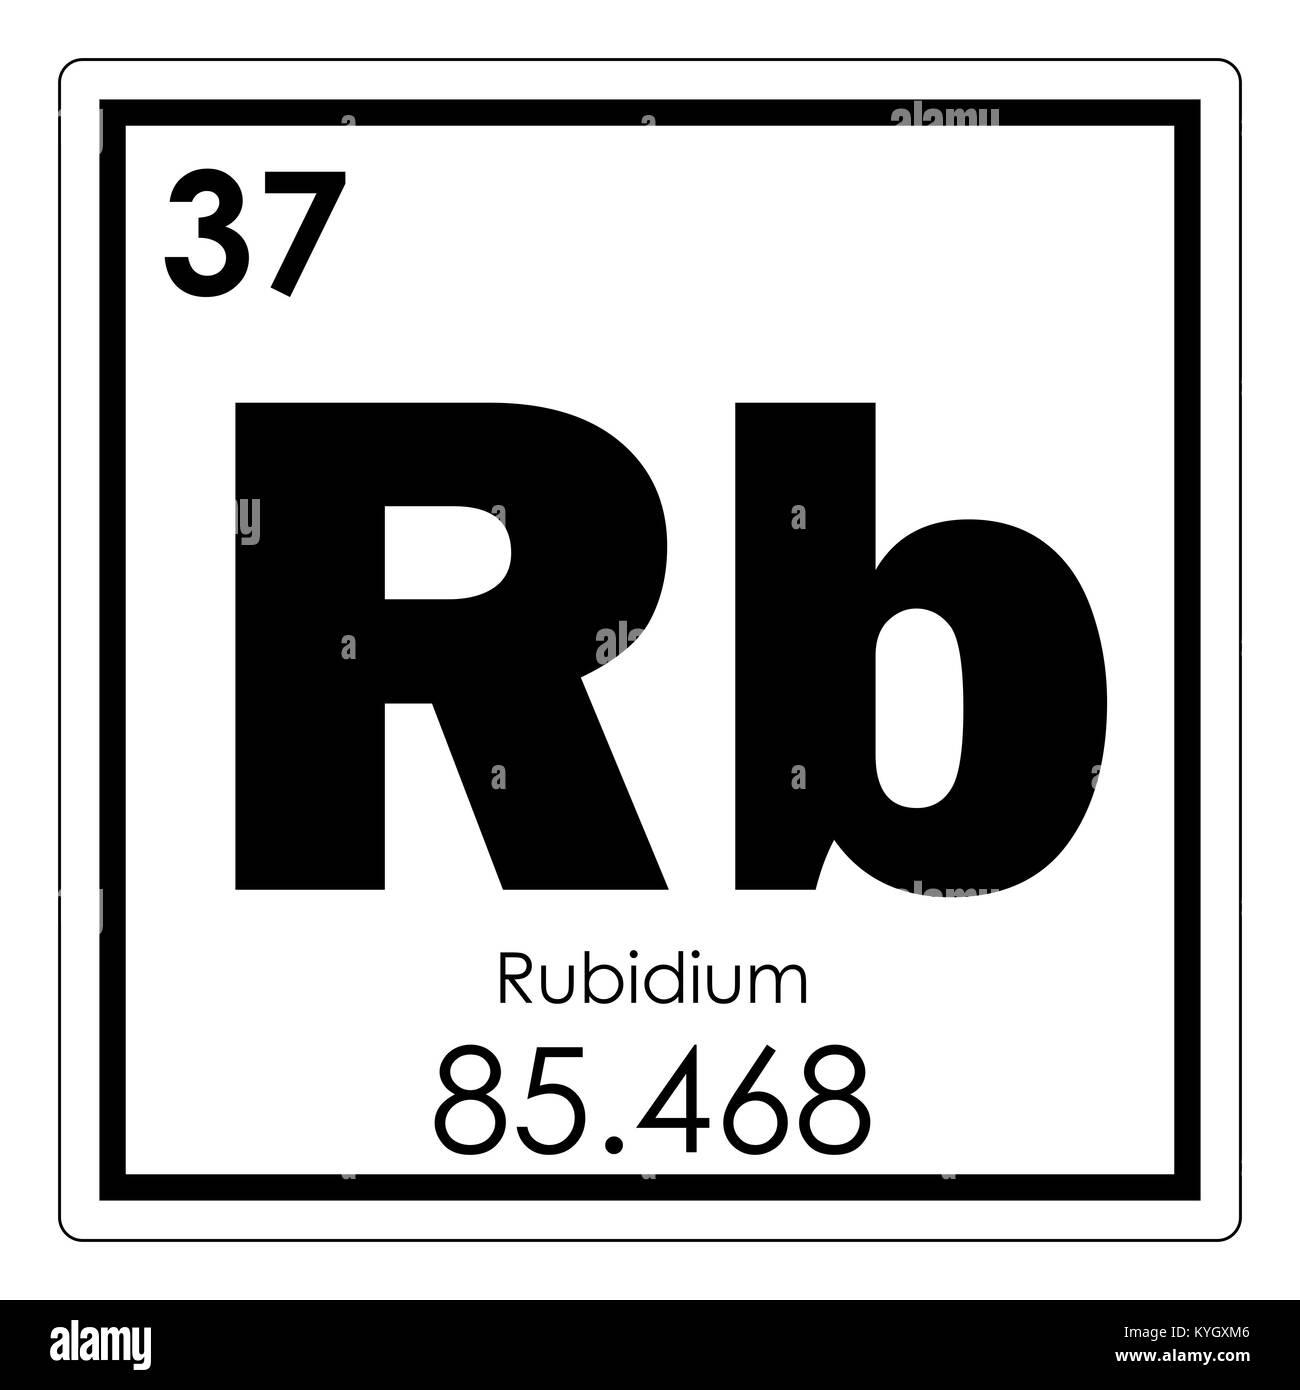 Rubidium chemical element periodic table science symbol stock photo rubidium chemical element periodic table science symbol buycottarizona Choice Image